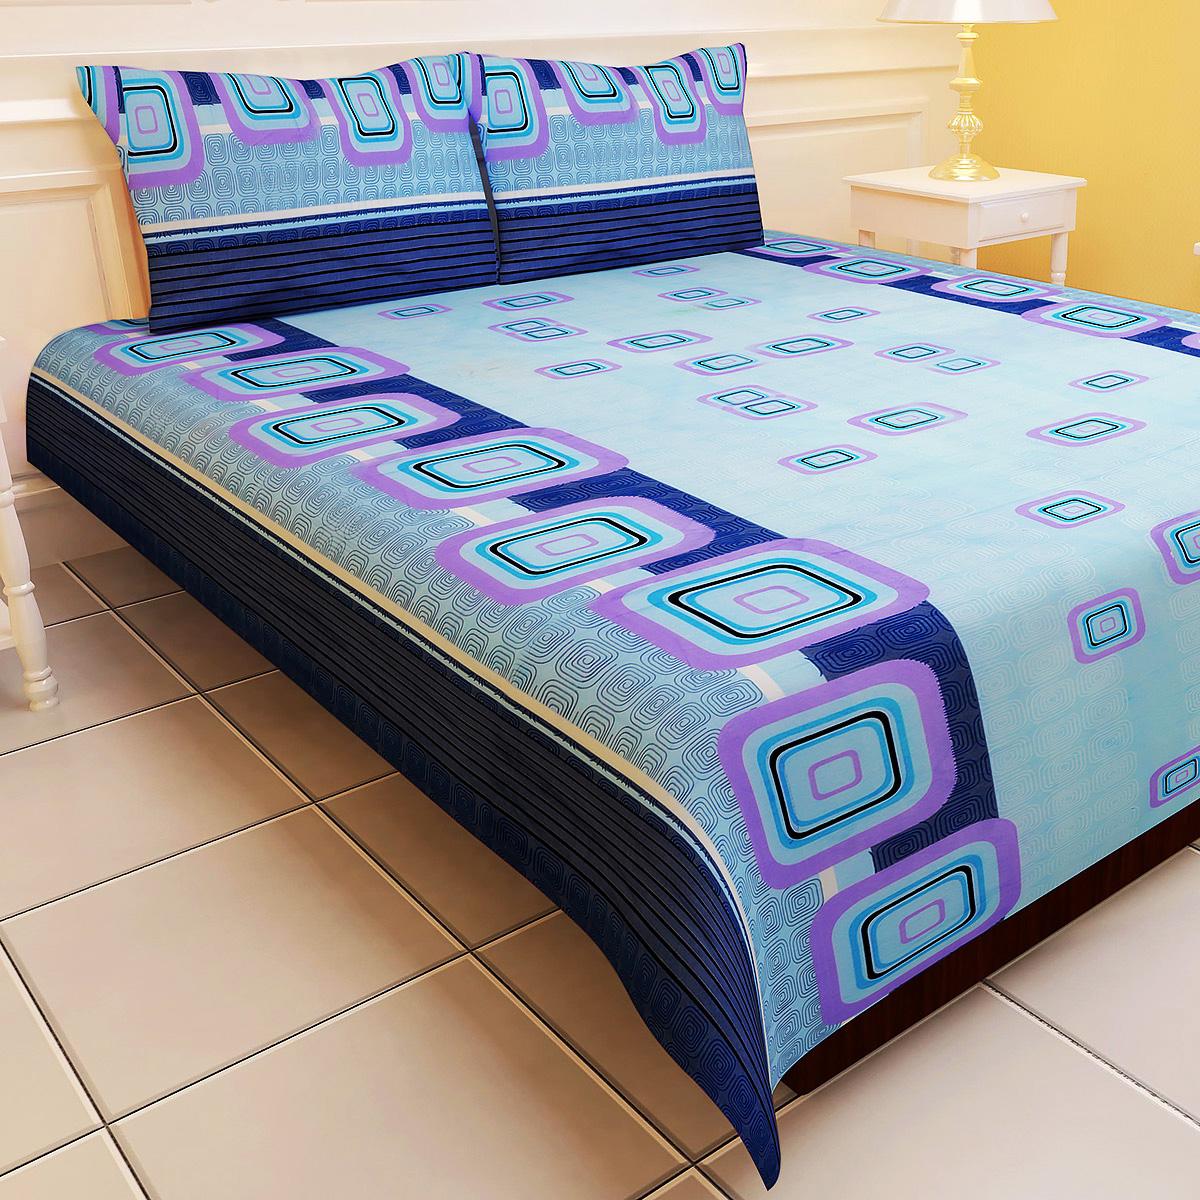 Buy Luxury Queen 8 Designer Double Bed Sheets With 16 .